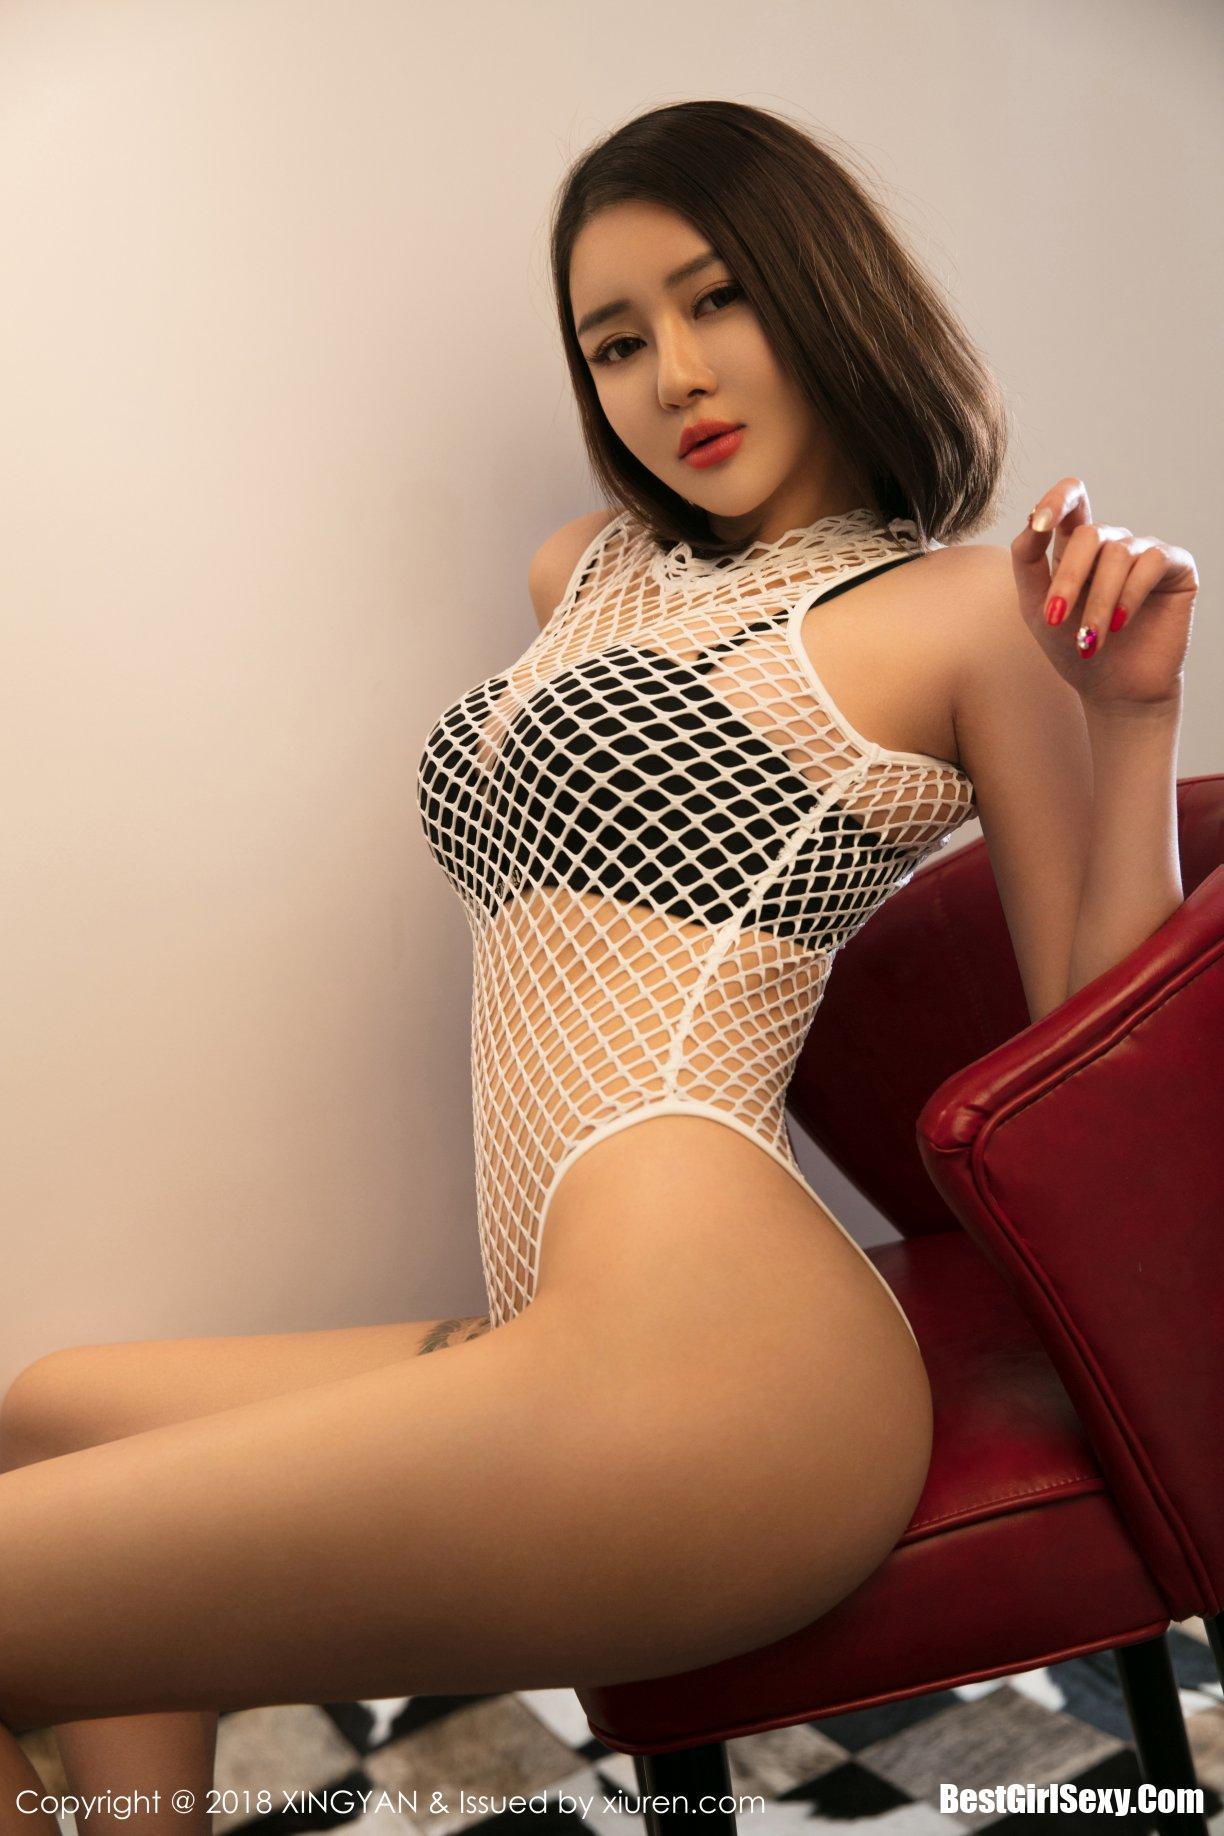 廿十, XingYan星颜社 VOL.046 Nian Shi, XingYan星颜社 VOL.046, Nian Shi